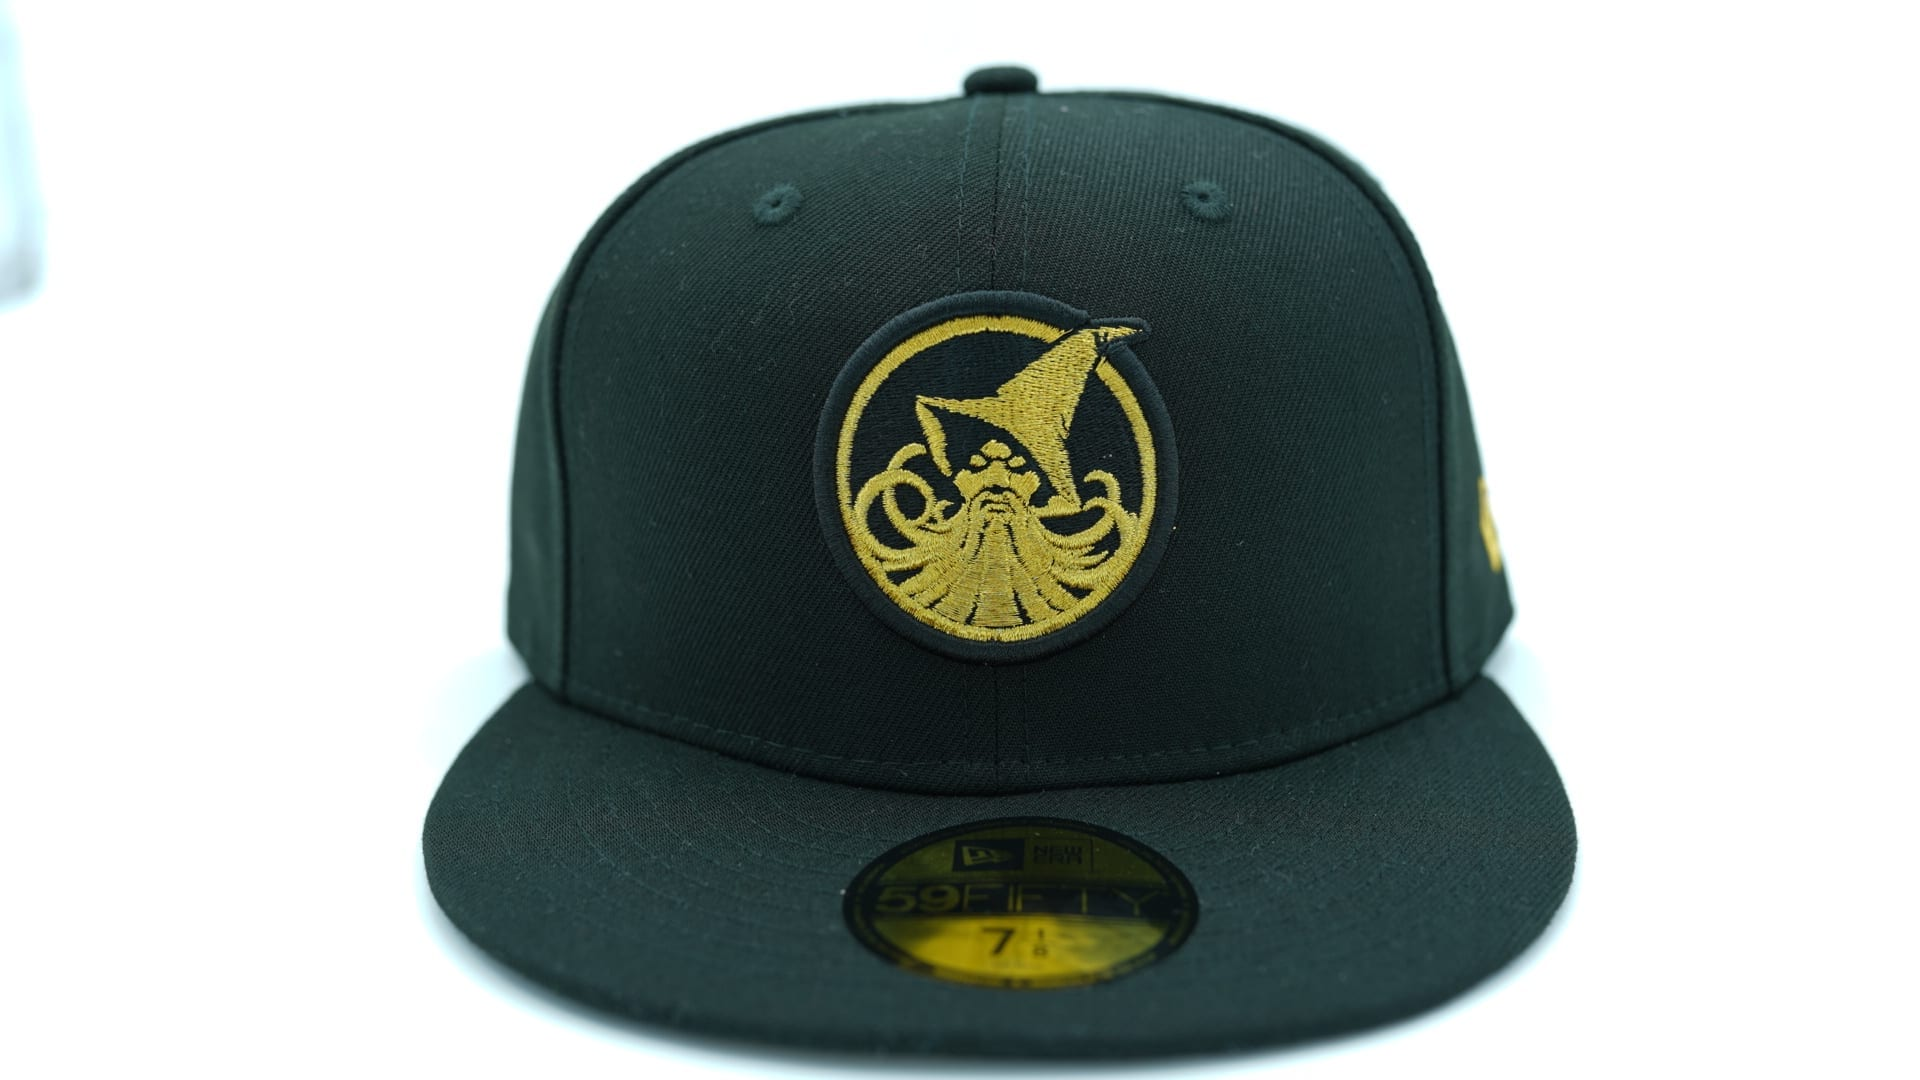 Tonal Black Durham Bulls Metal Badge Black 59FIFTY Fitted Cap by NEW ERA x MiLB